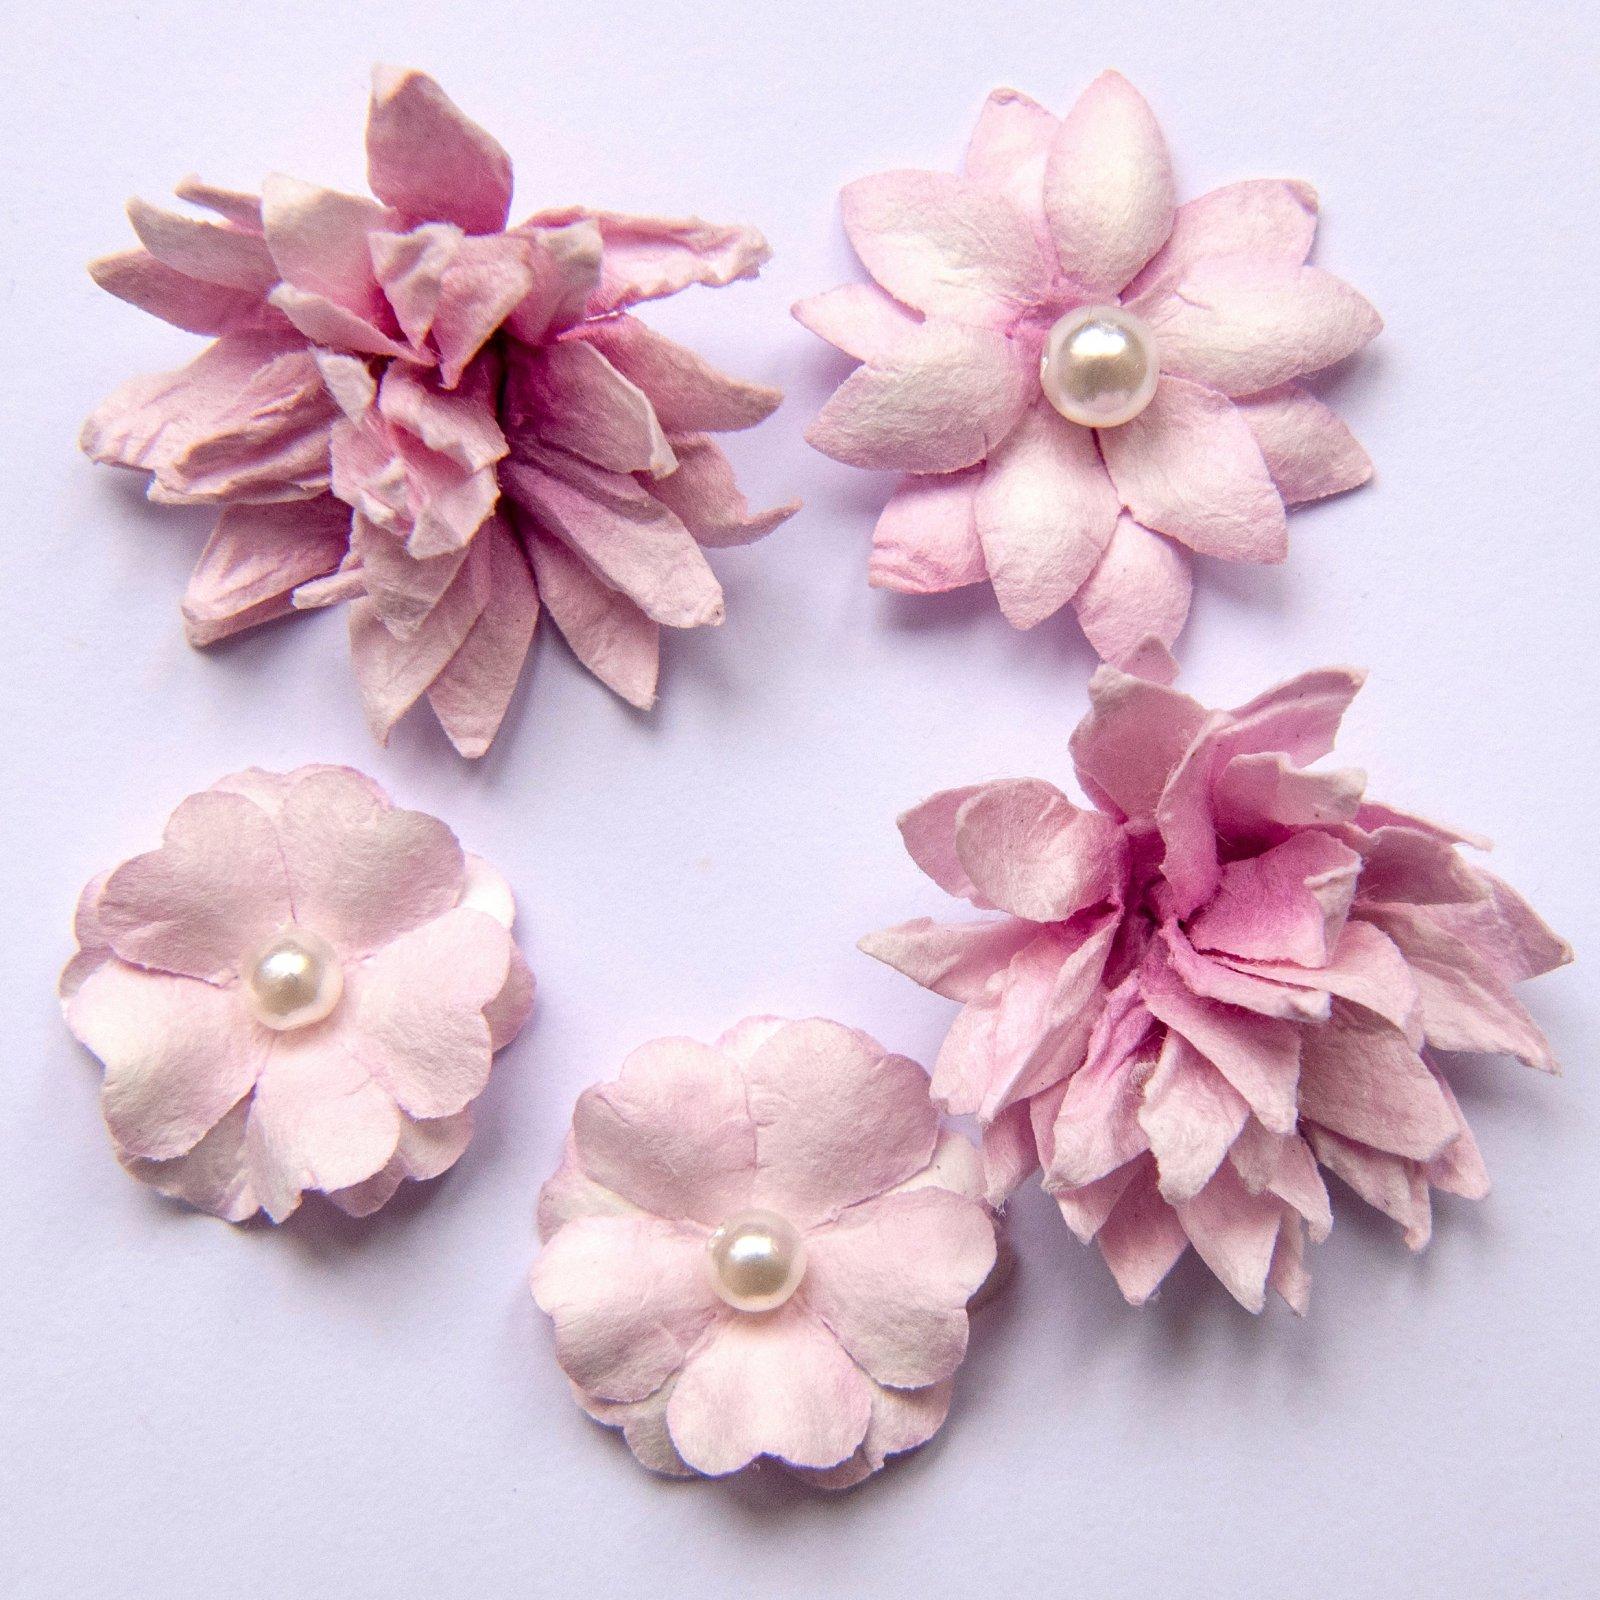 Flower mini series punch